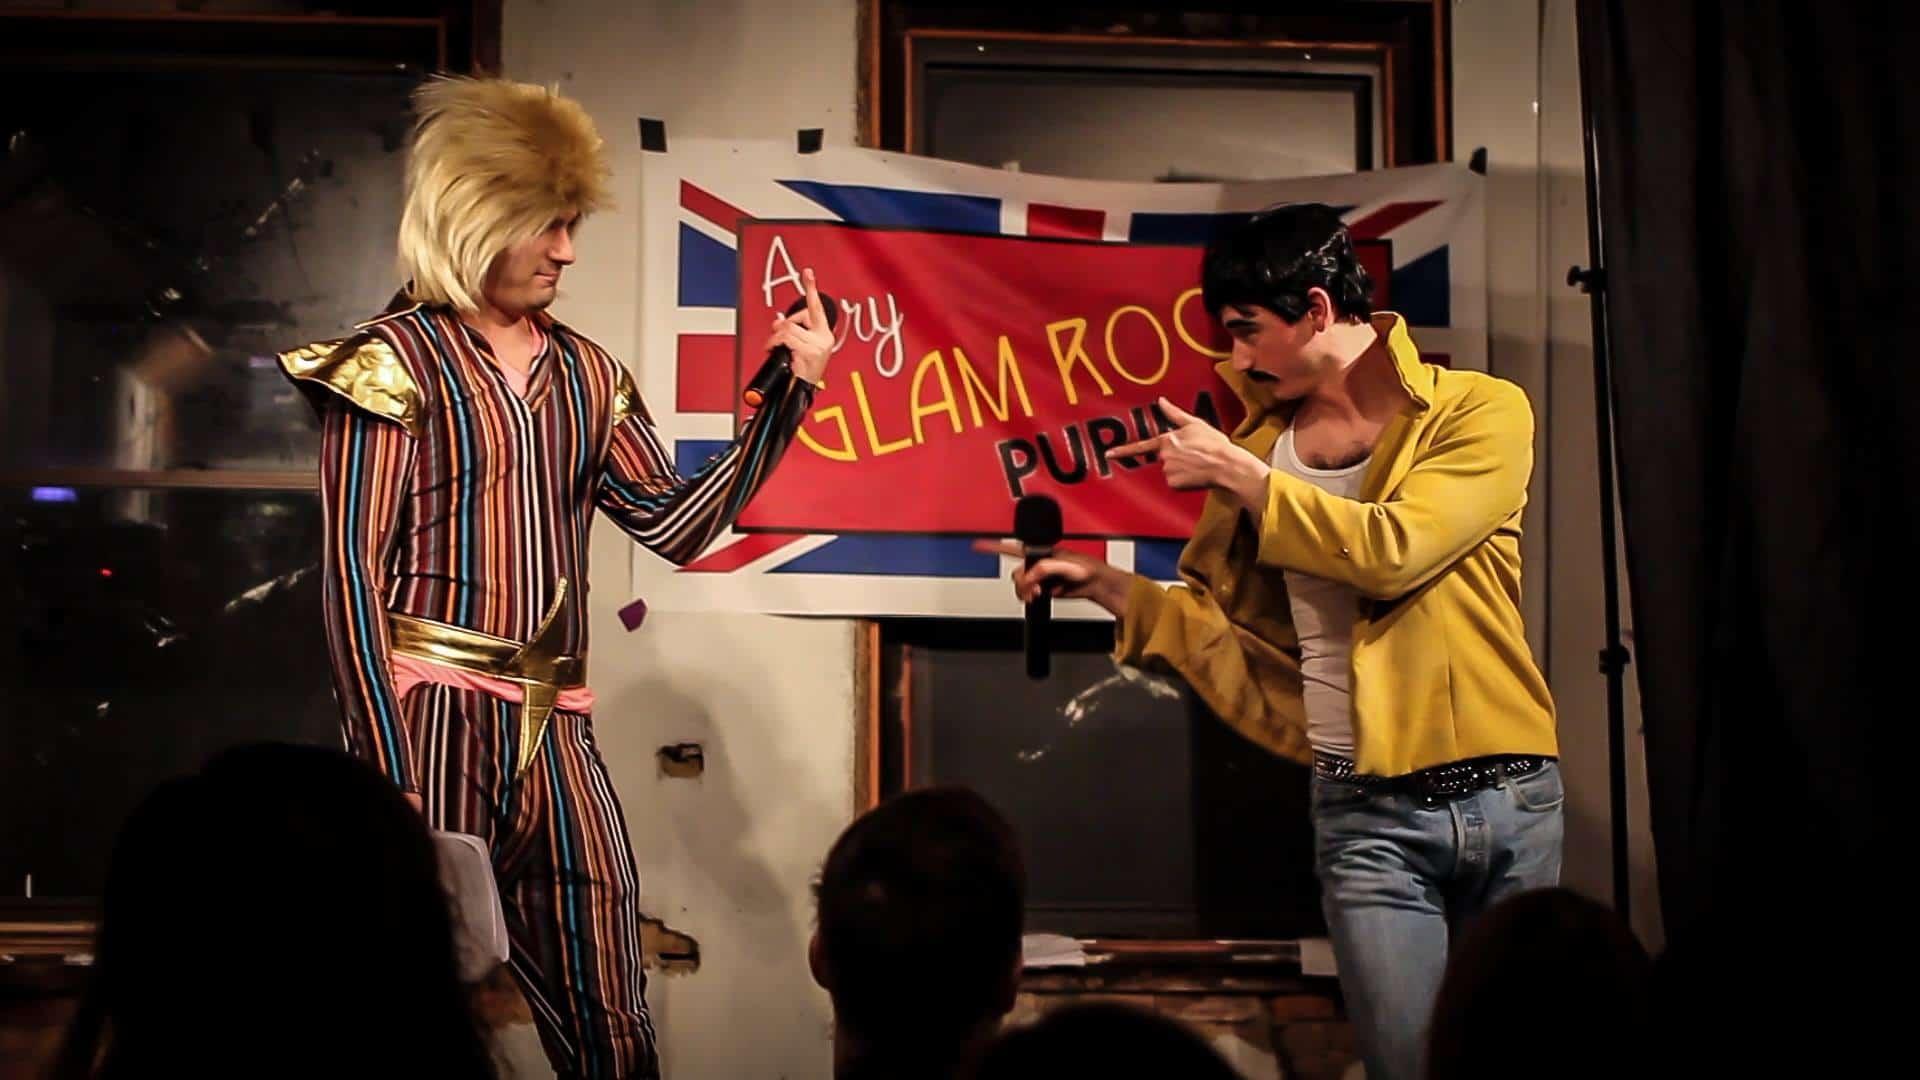 Freddie Mordachai, Haman Bowie - A Very Awesome Purim